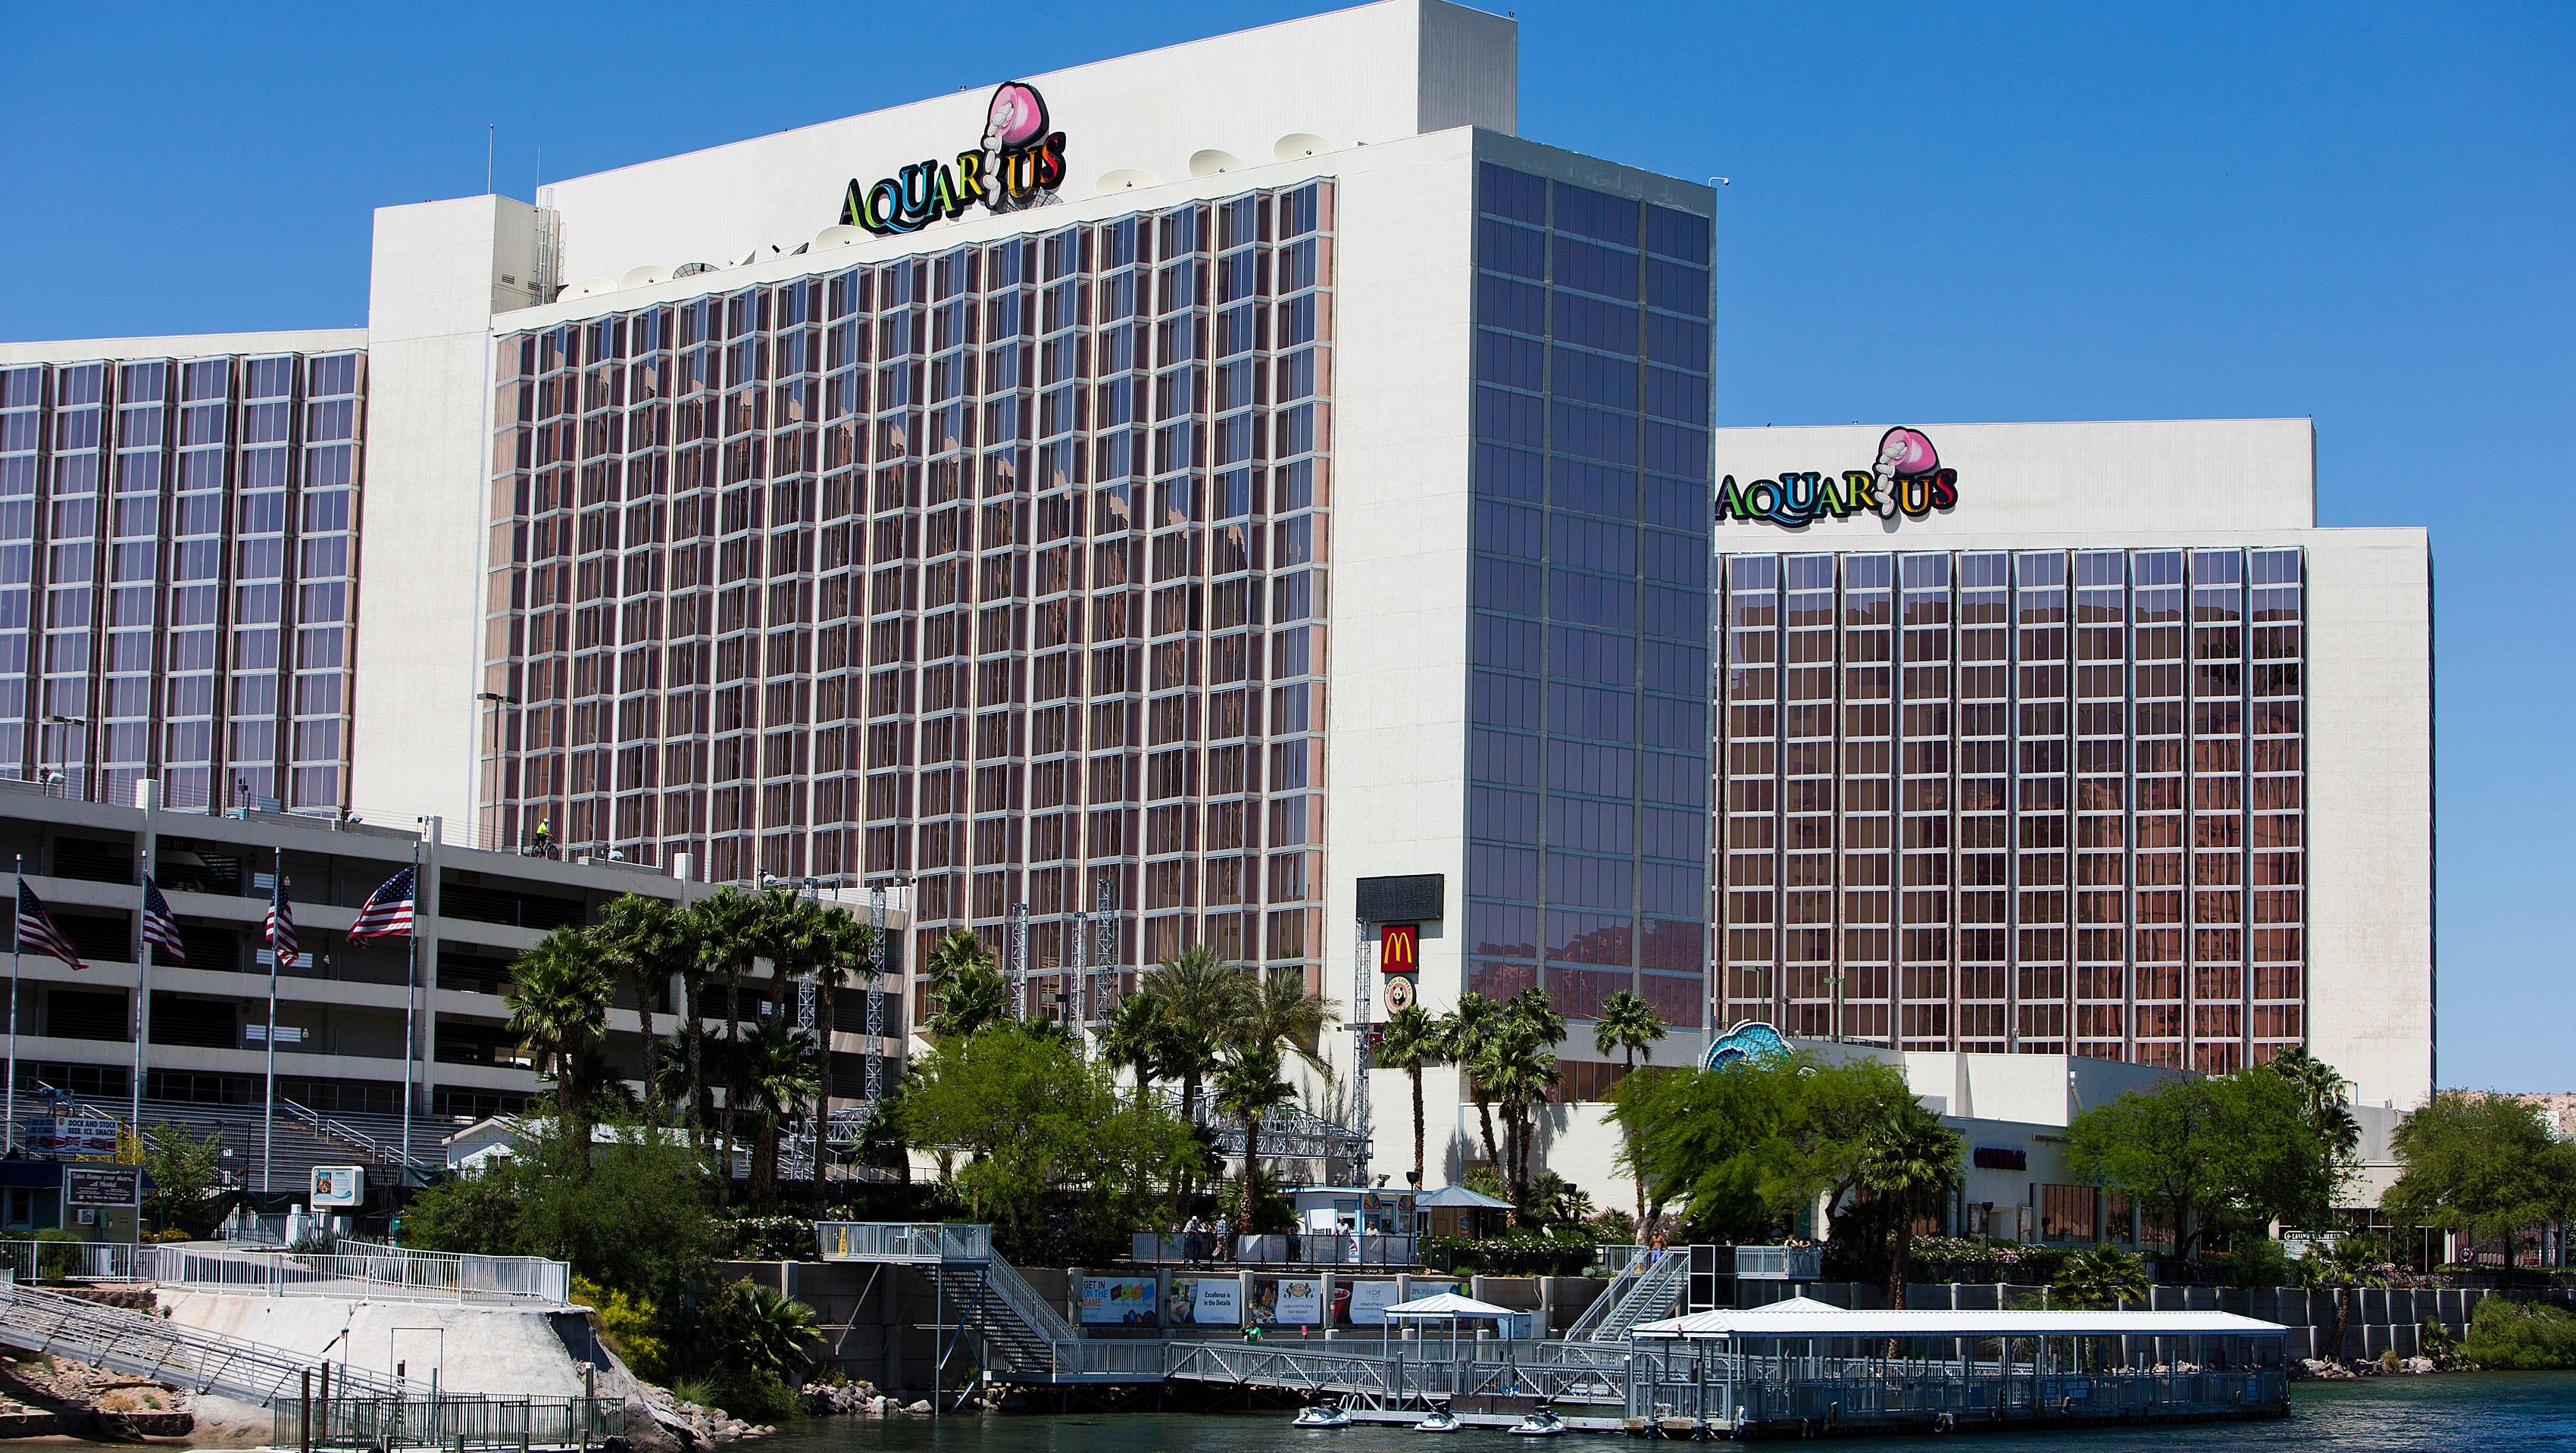 Aquarius casino bullhead city az free play slot machines for fun